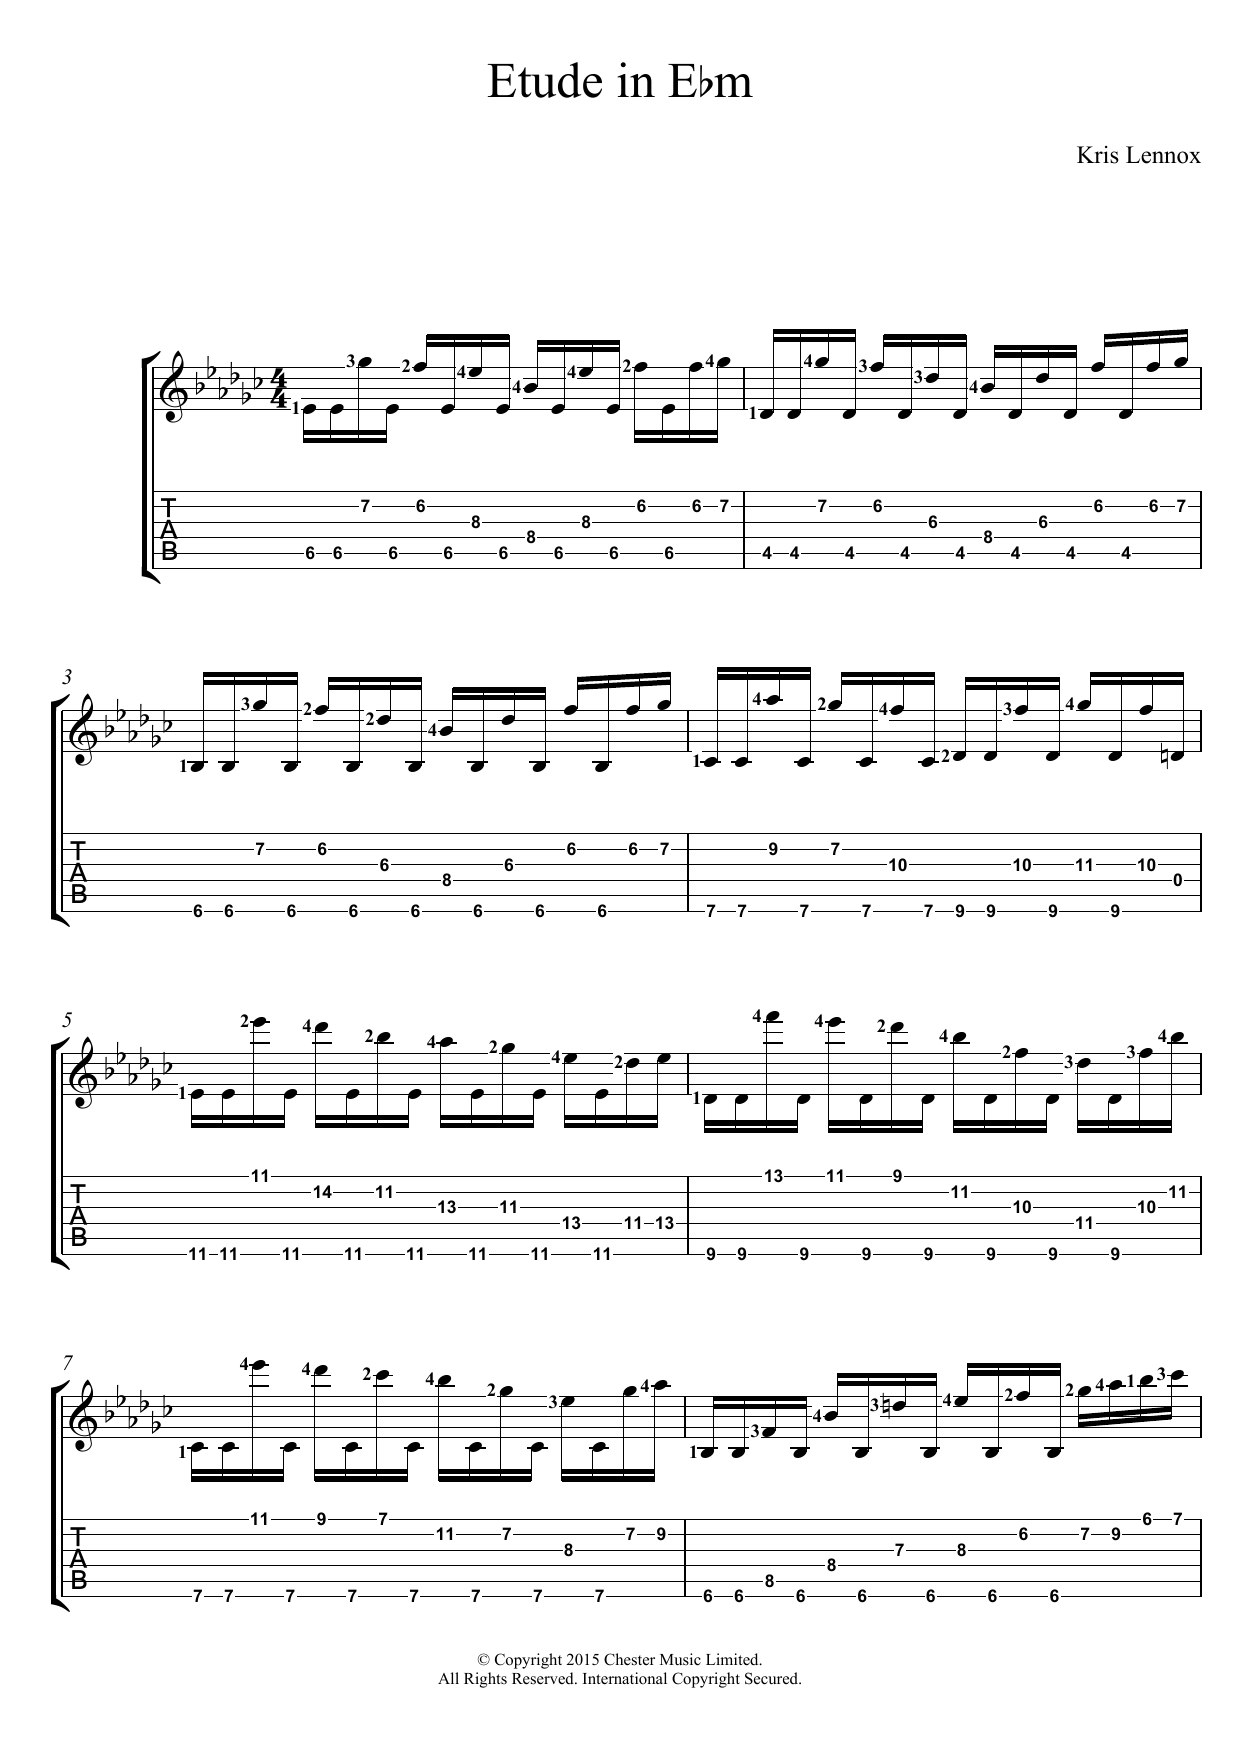 Kris Lennox - Etude In E Flat minor